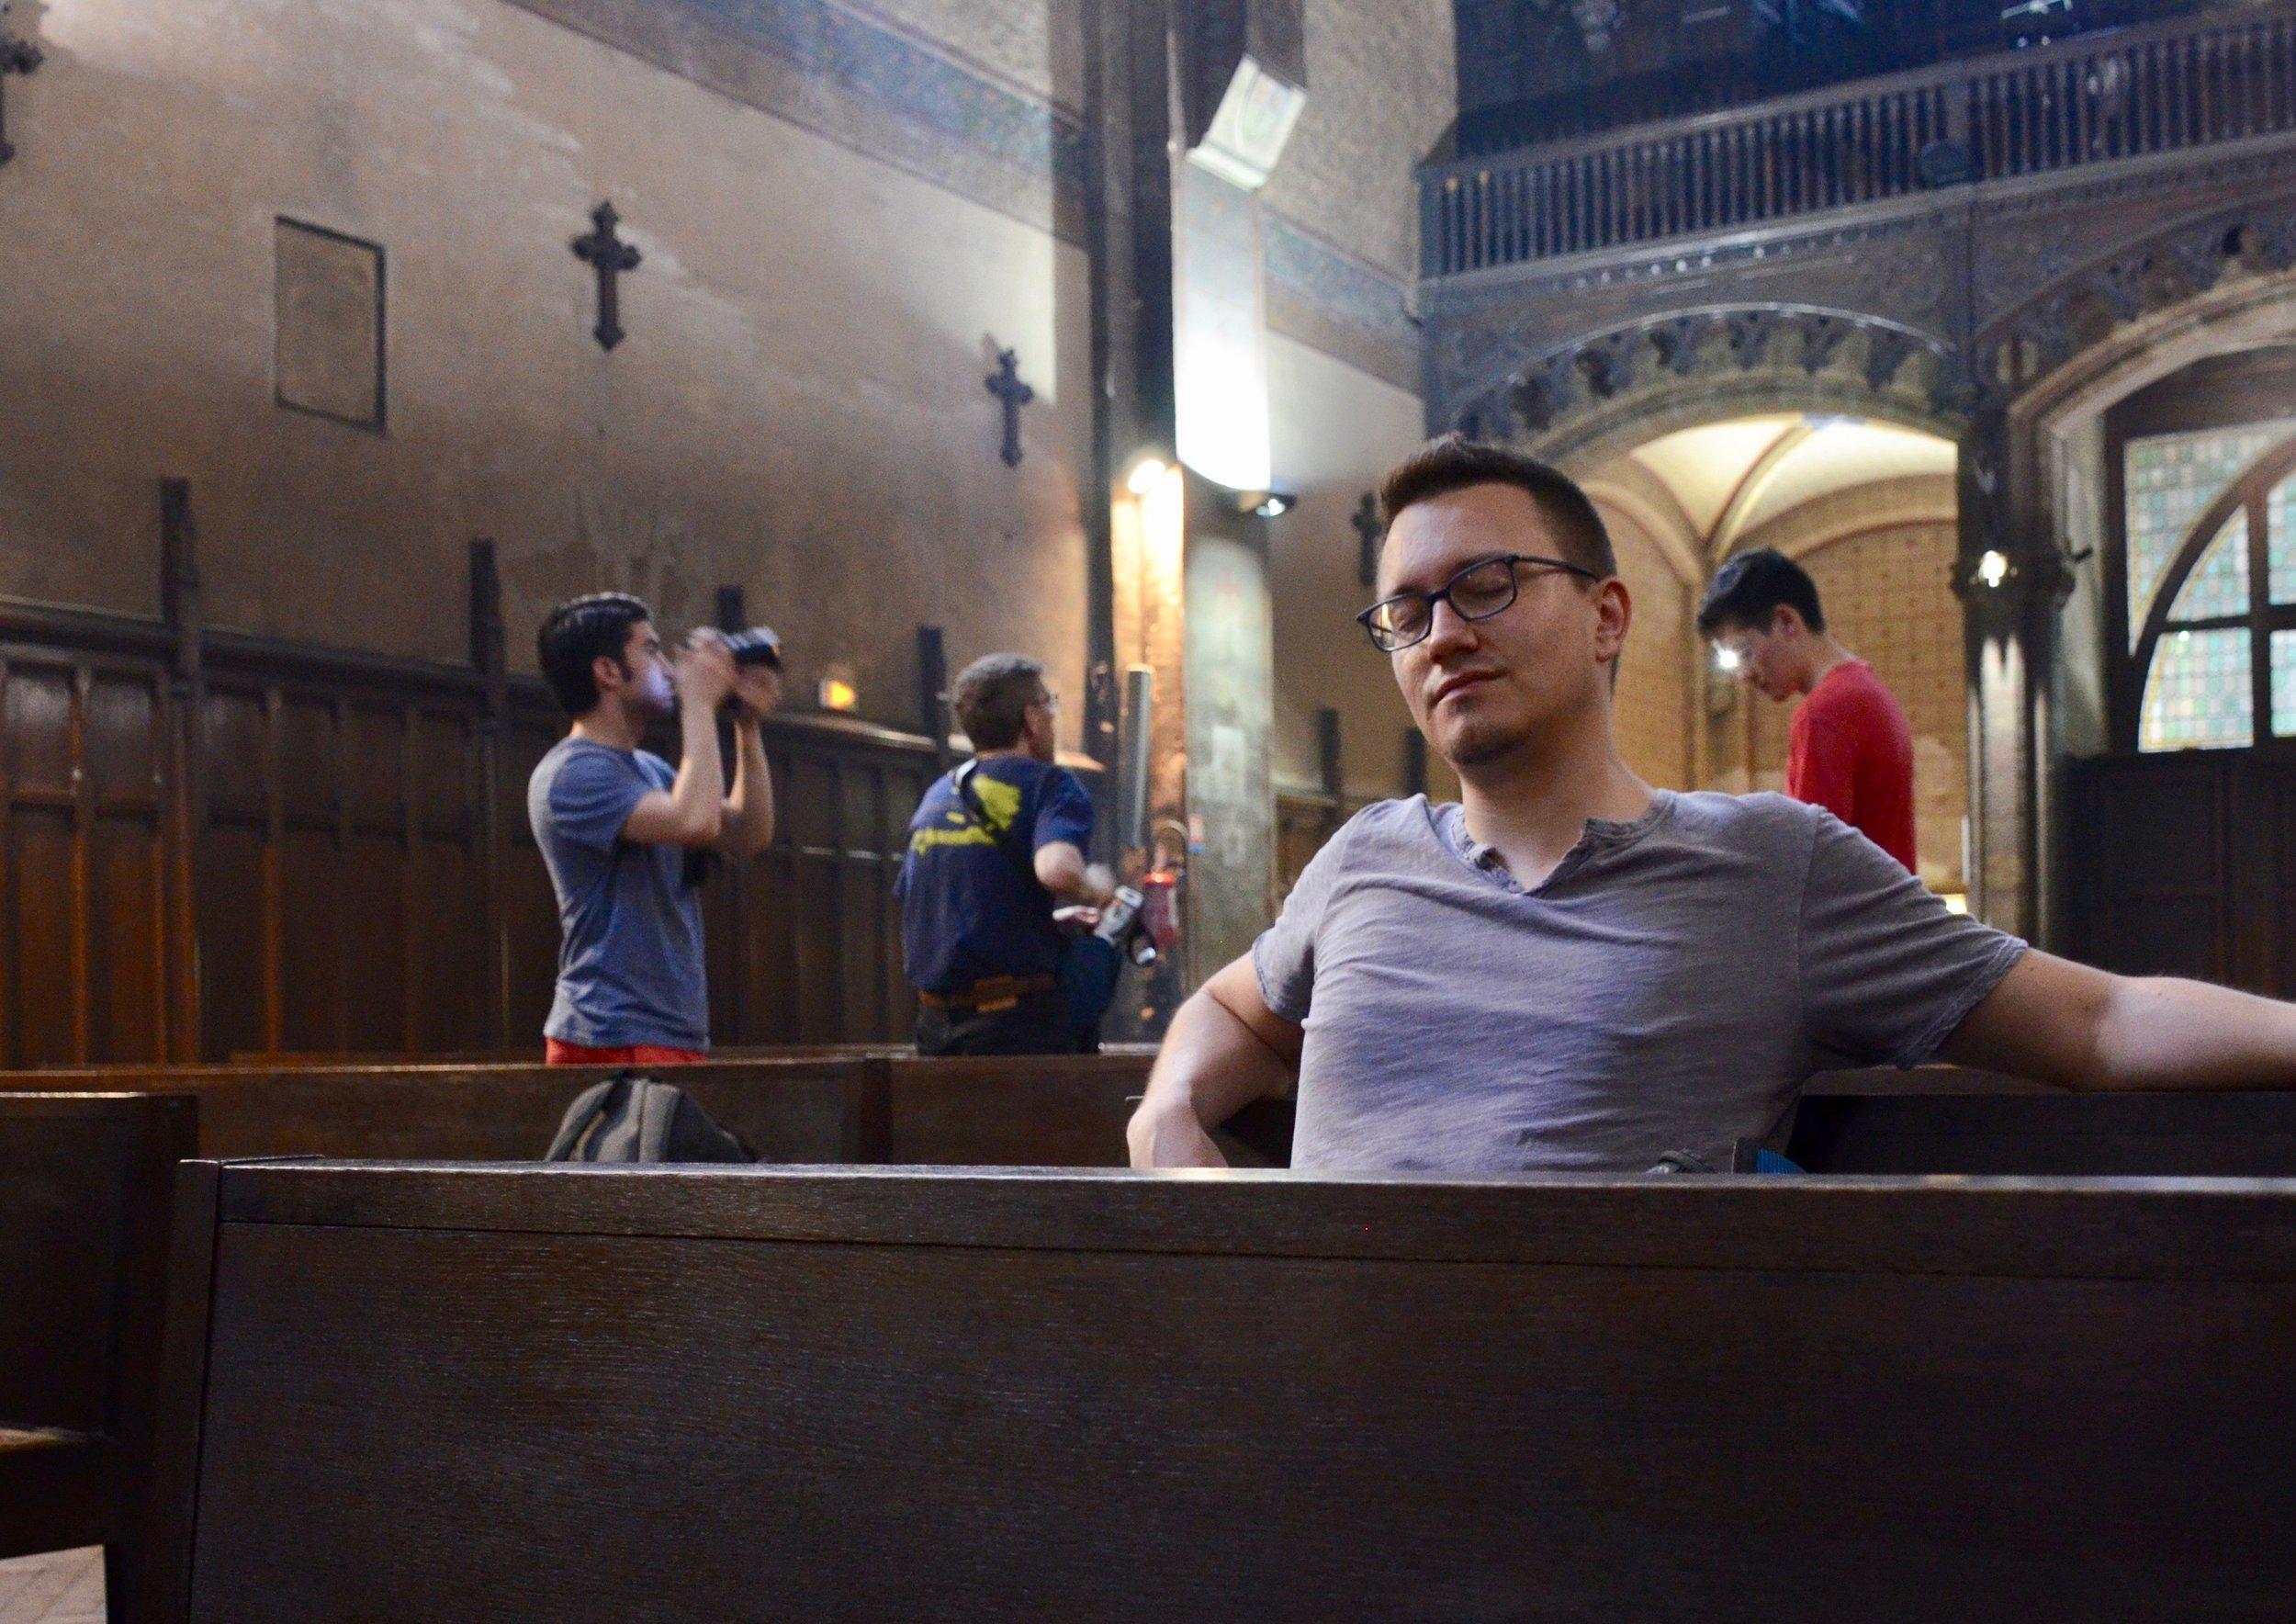 Corey De Tar listening to the Puget organ in Notre-Dame du Taur, Toulouse